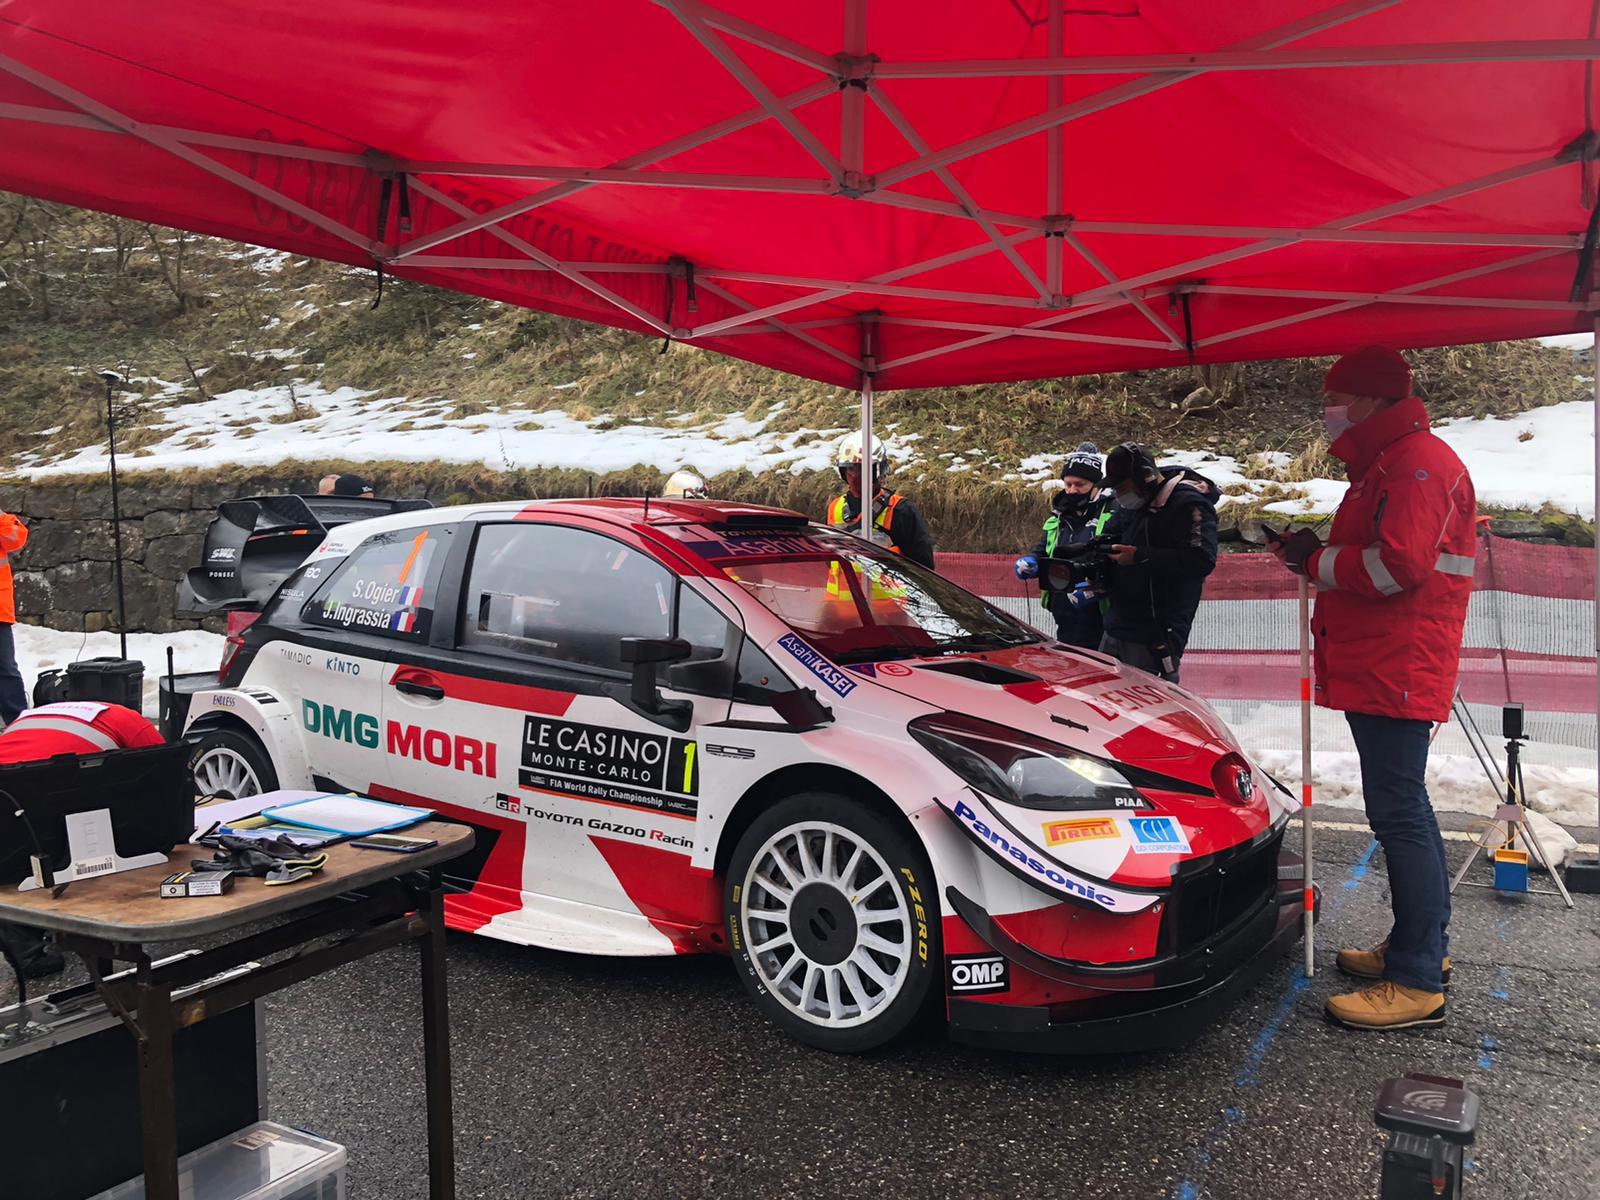 WRC: 89º Rallye Automobile de Monte-Carlo [18-24 Enero] - Página 4 210121_OgierSS2STart